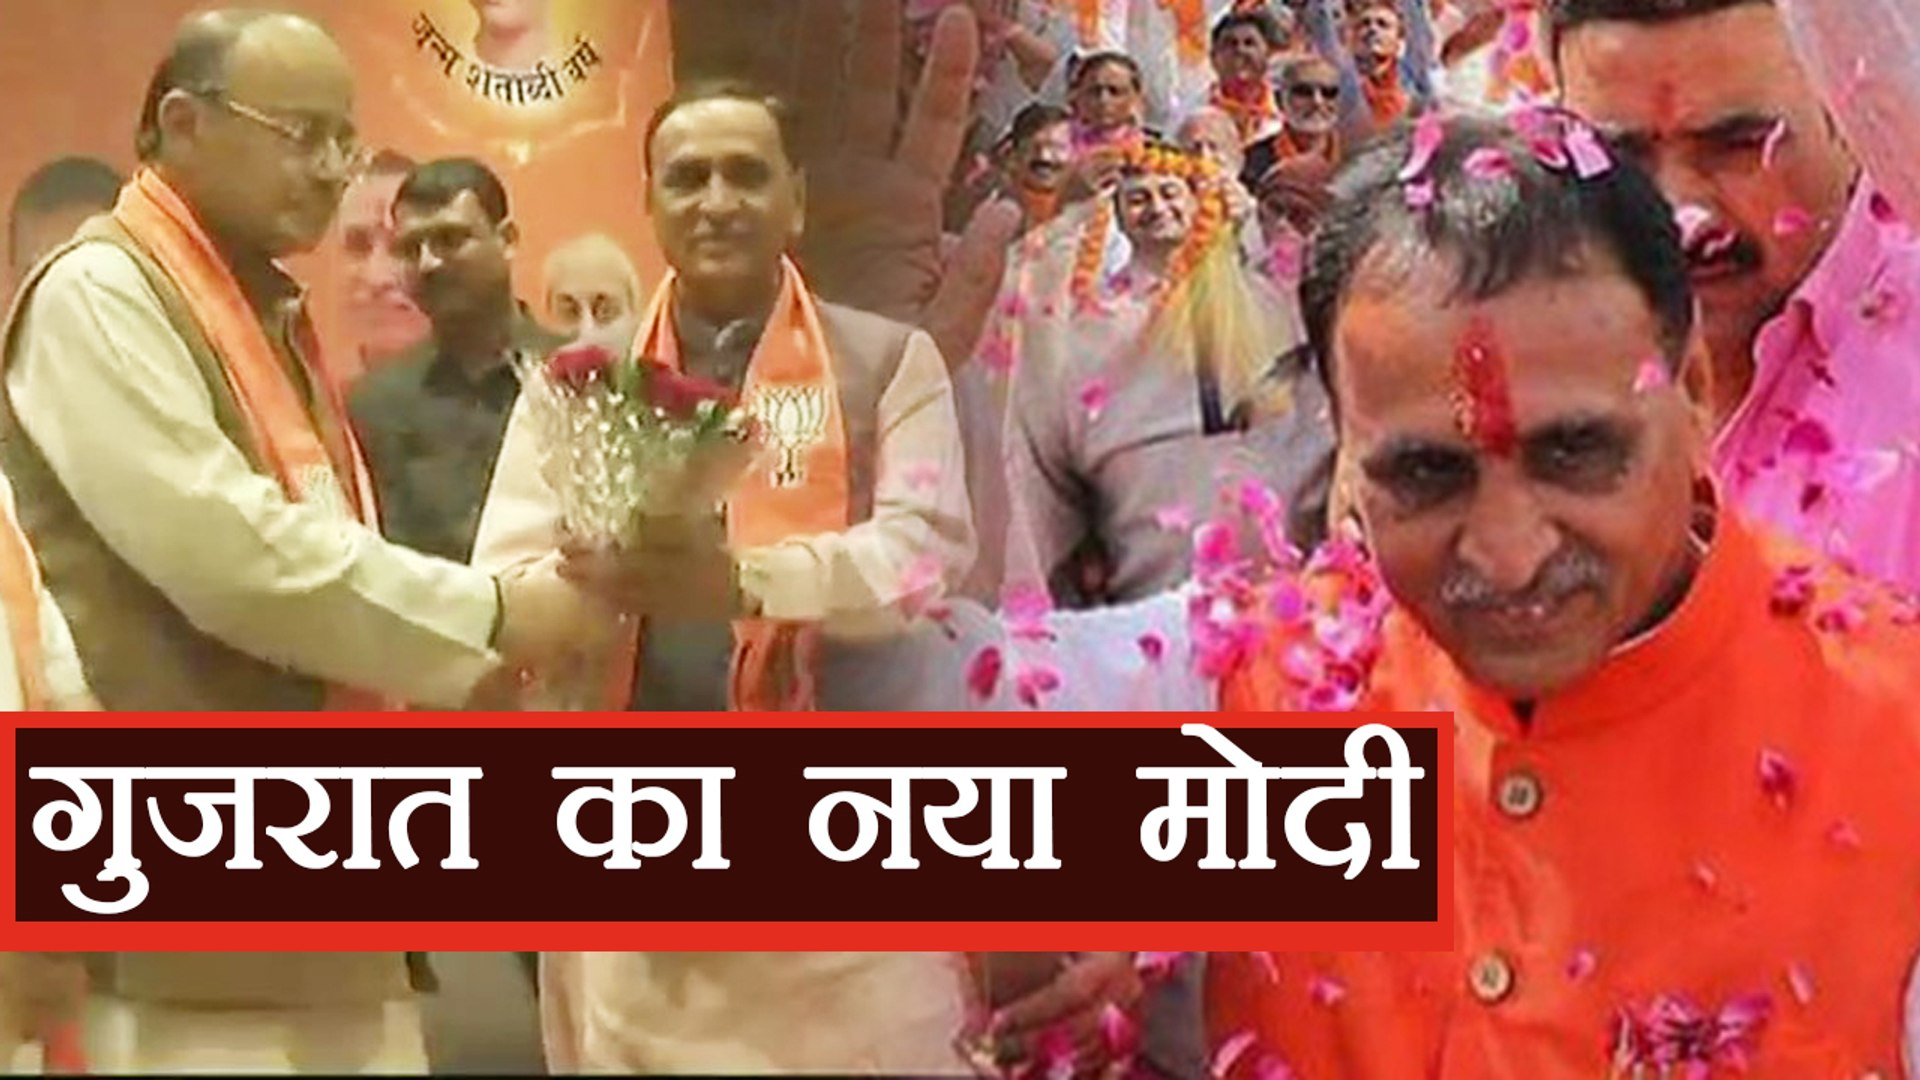 Vijay Rupani जिन्हें दी गई Gujarat के CM की जिम्मेदारी, Vijay Rupani Biography | वनइंडिया हिन्दी